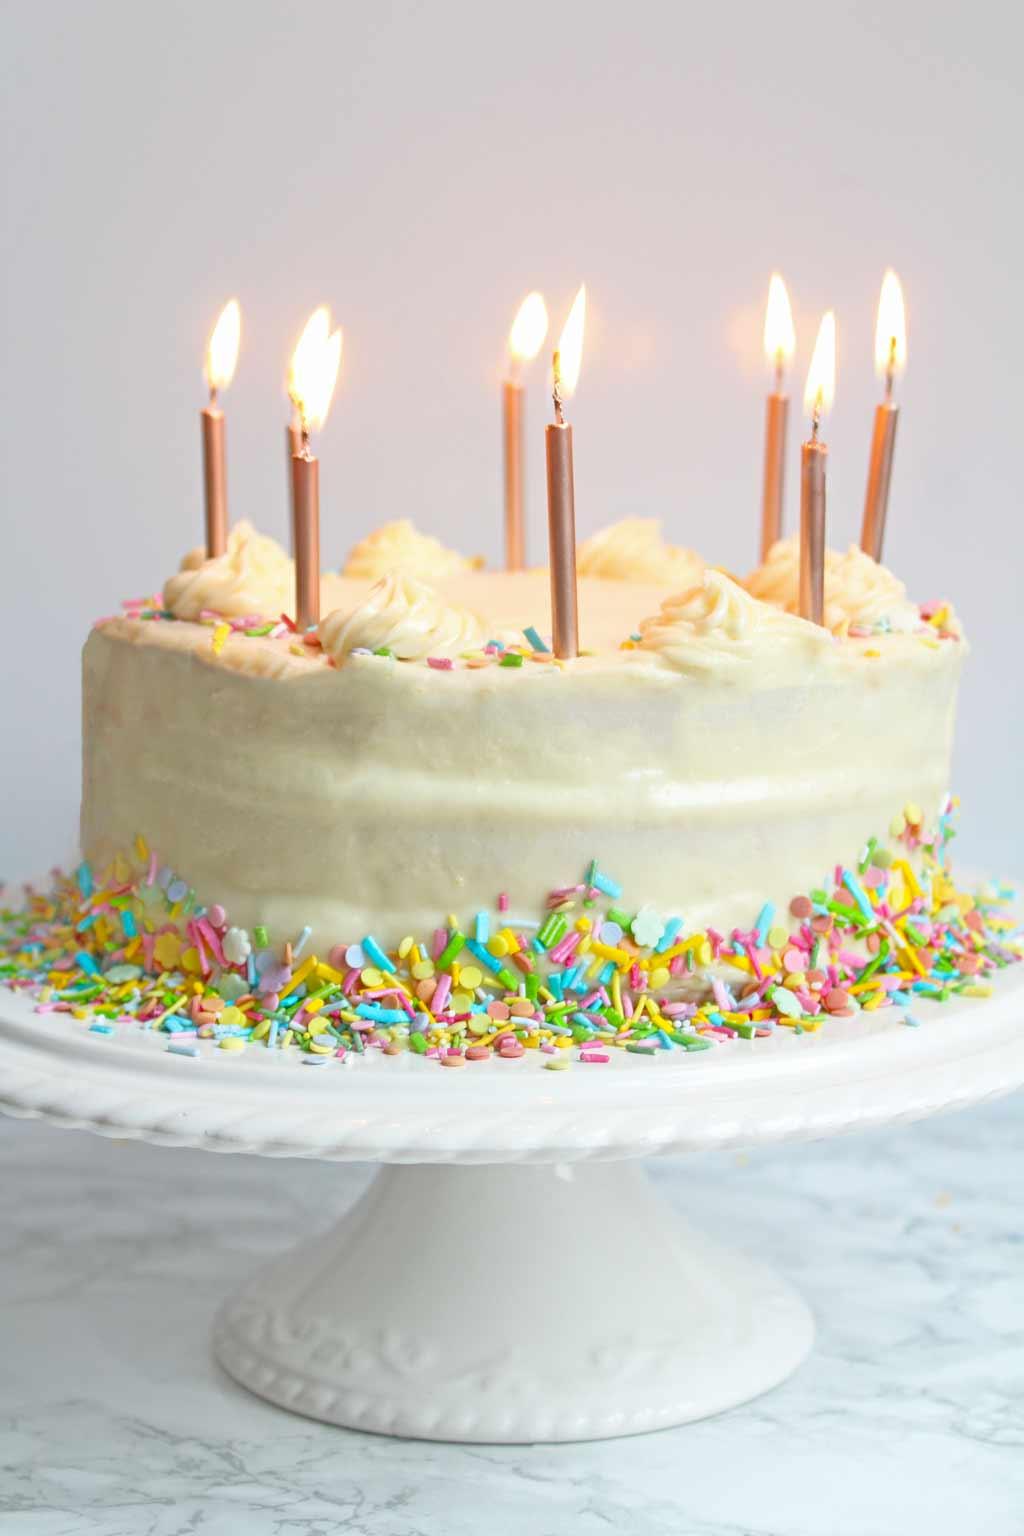 Astounding Vegan Birthday Cake Bakedbyclo Vegan Dessert Blog Personalised Birthday Cards Paralily Jamesorg